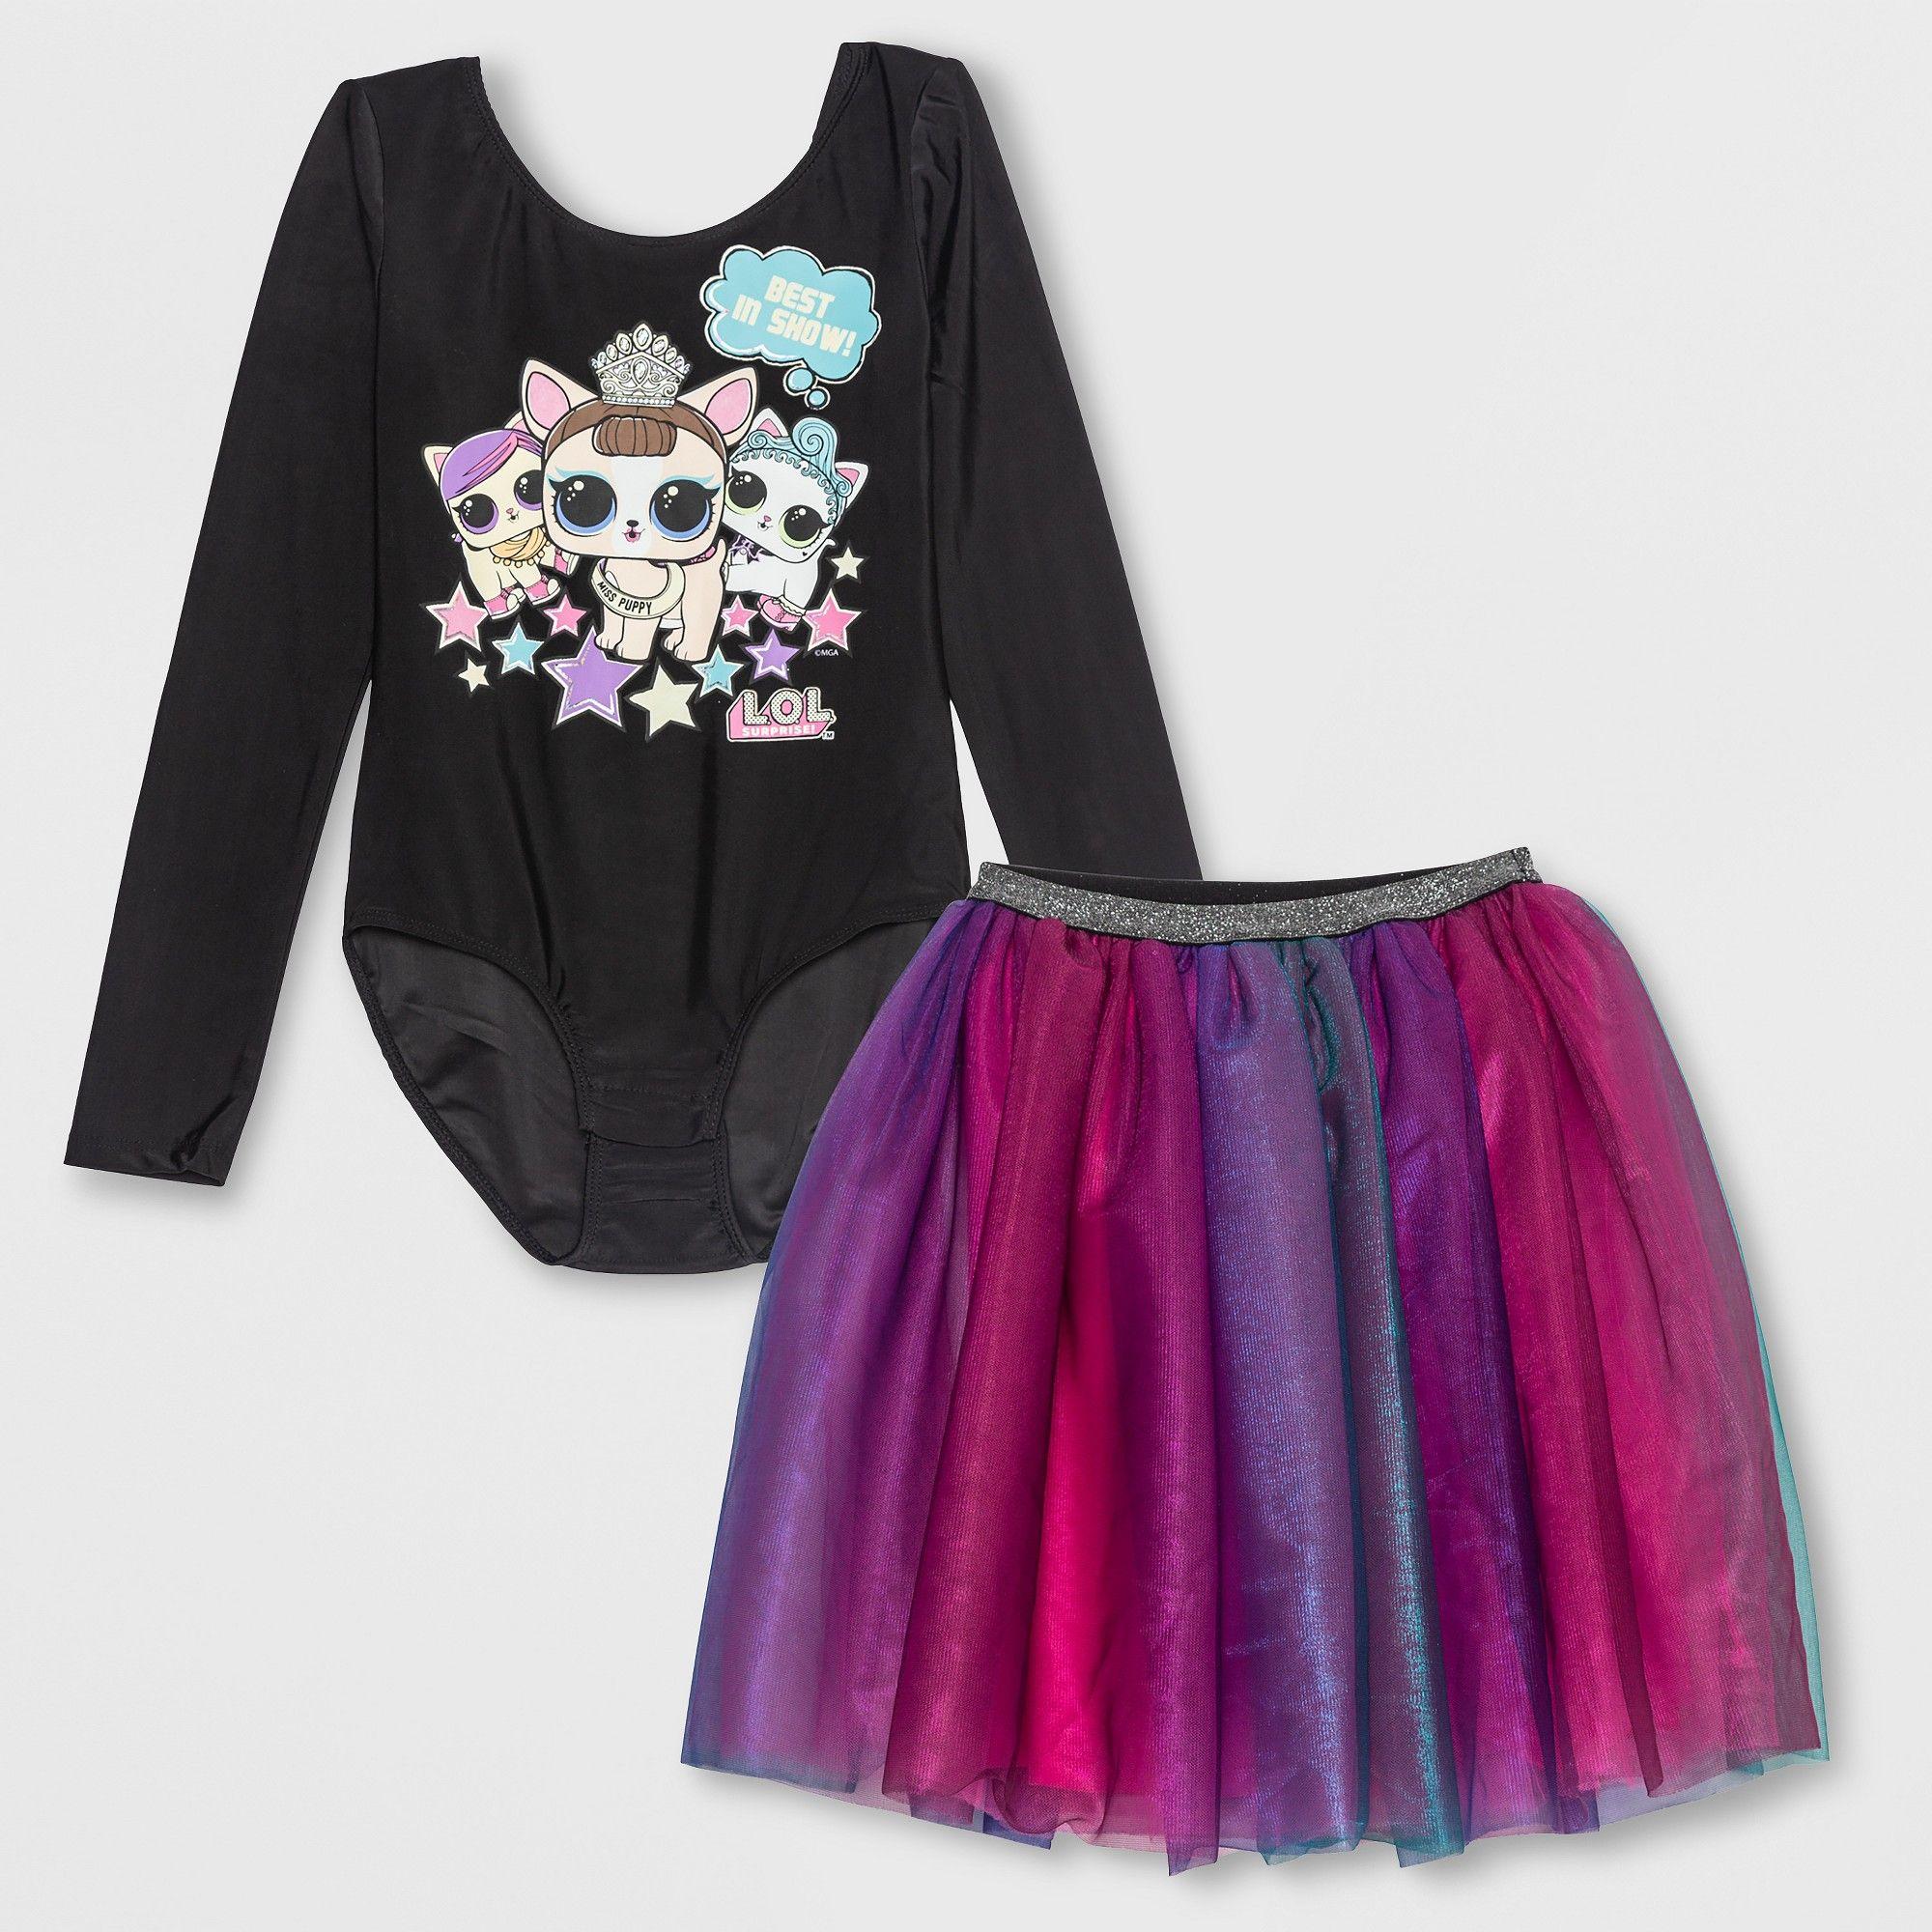 Series 4 Pets TUTU Skirt Bodysuit LOL Surprise TUTU Bodysuit L.O.L Surprise